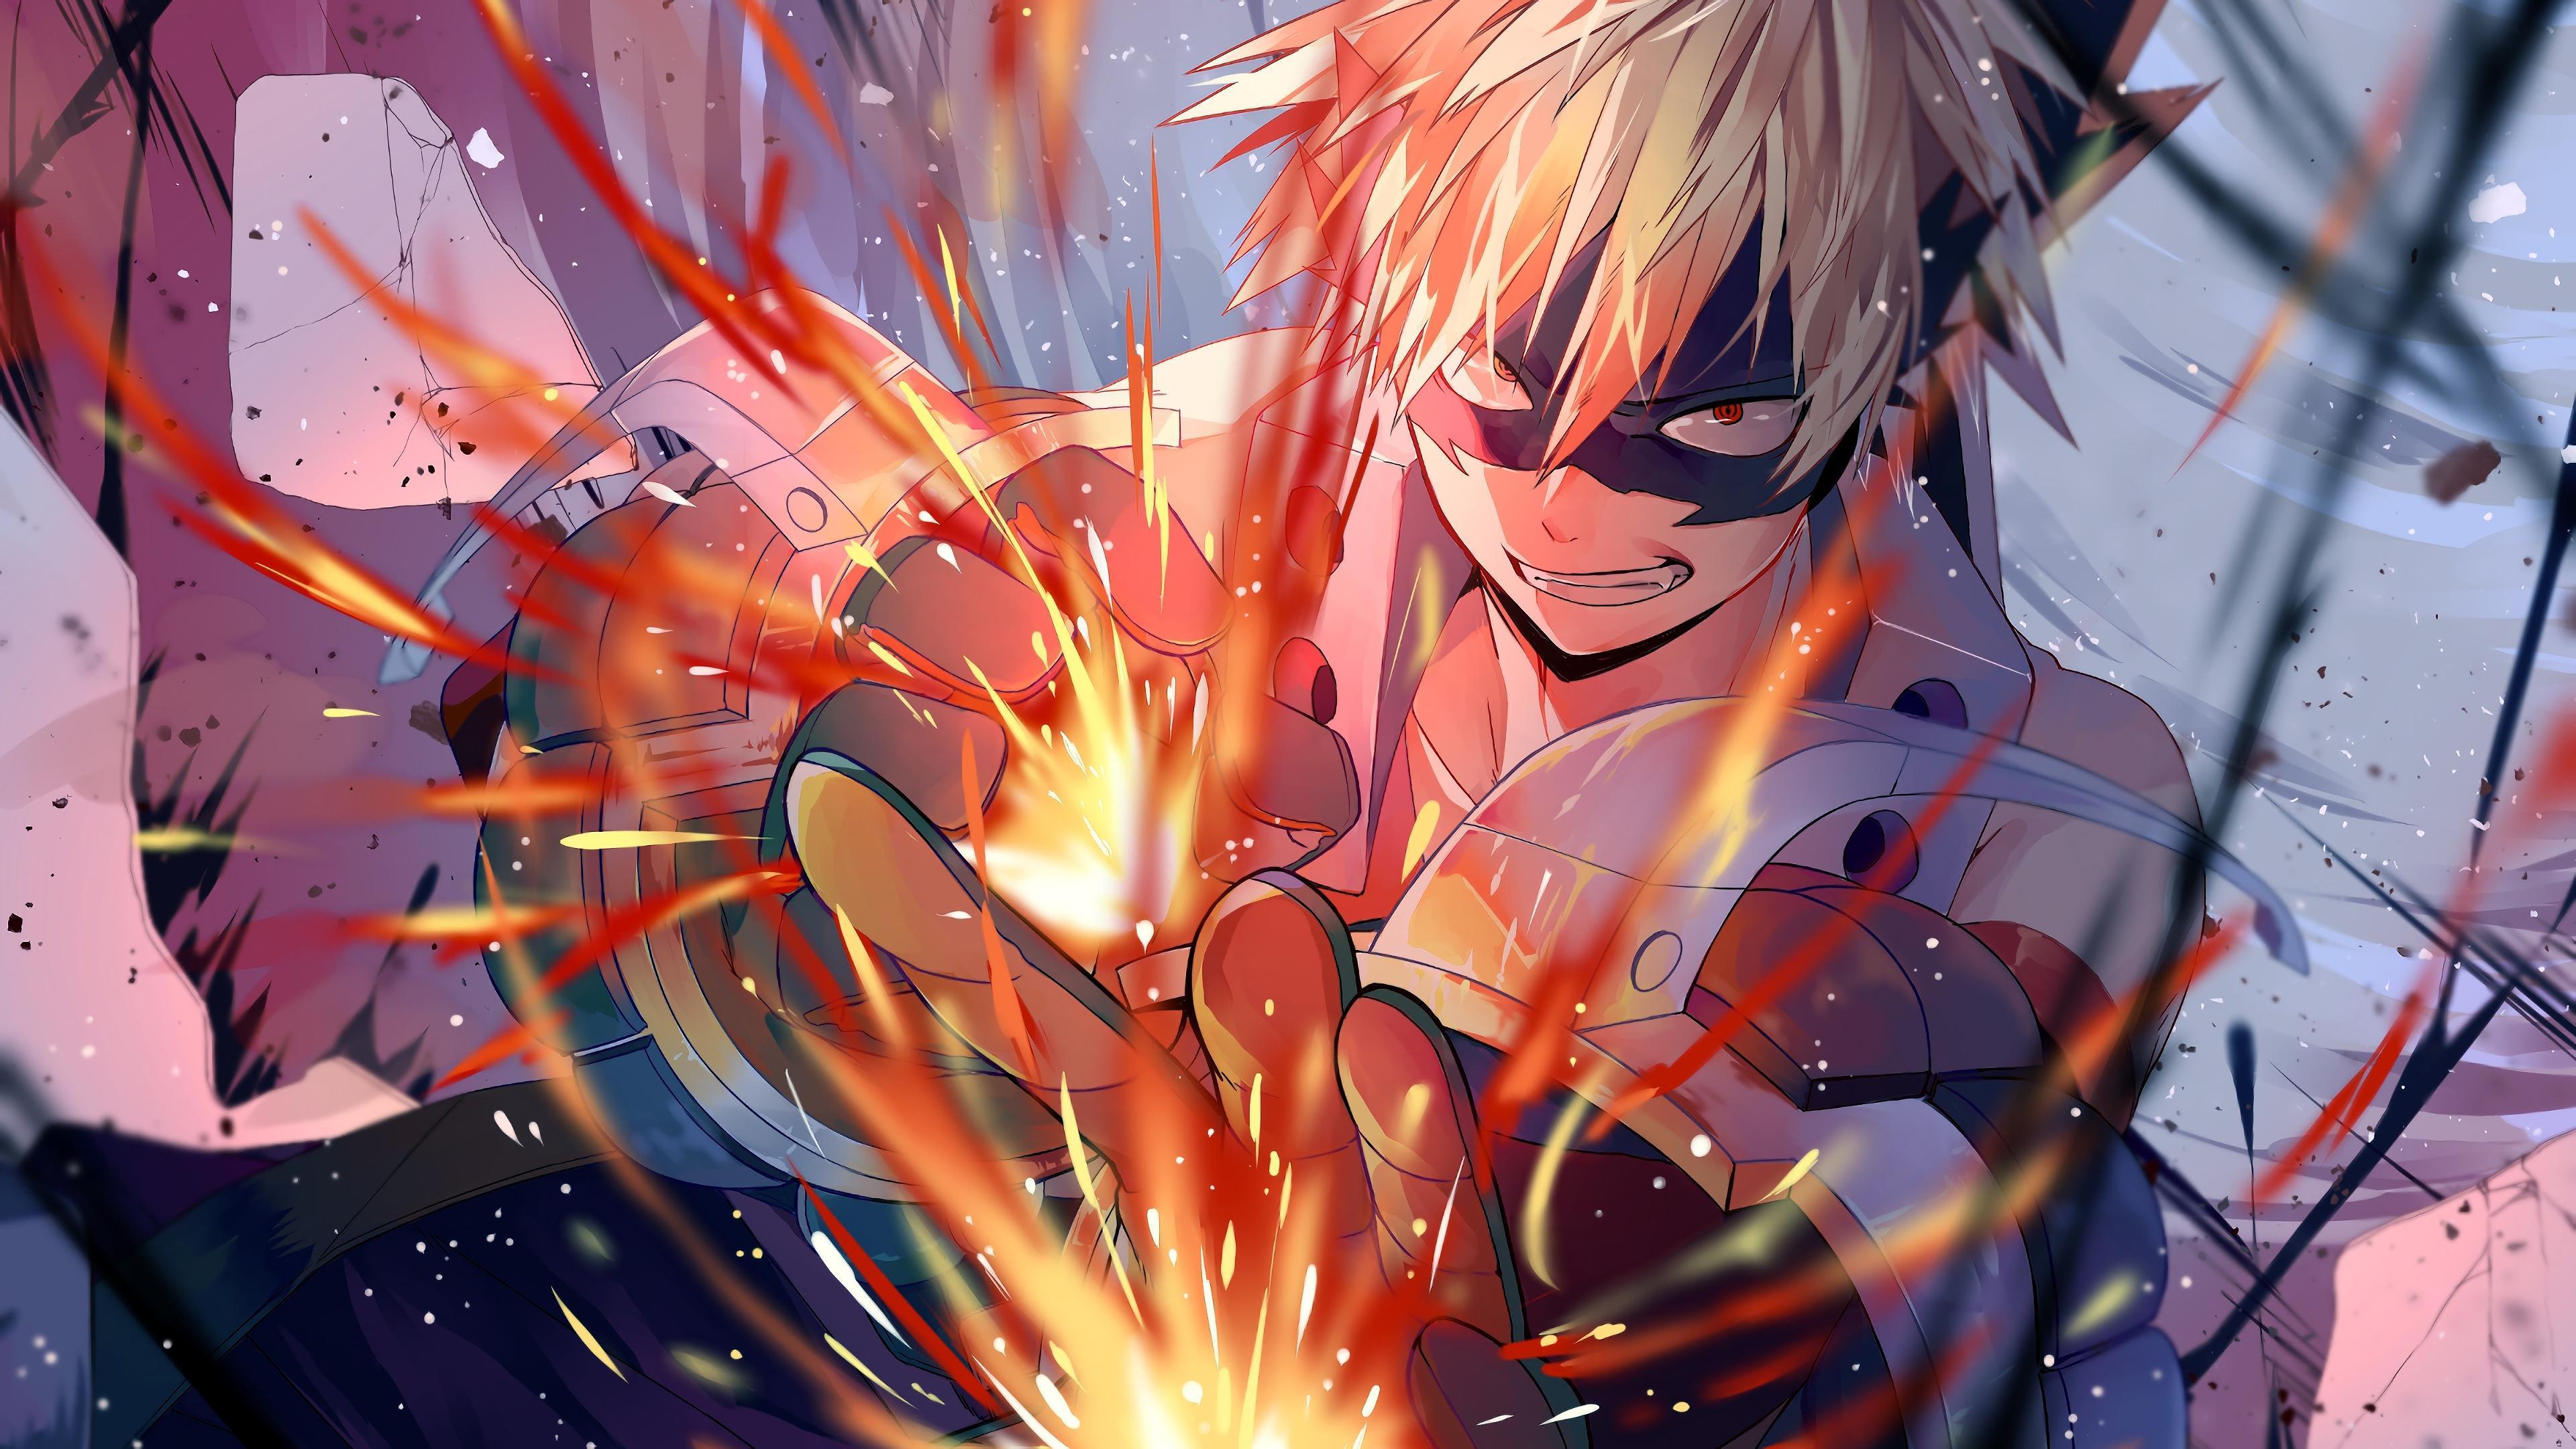 Boku no hero academia wallpaper and high quality picture gallery on minitokyo. My Hero Academia Bakugou X Kirishima Wallpapers ...